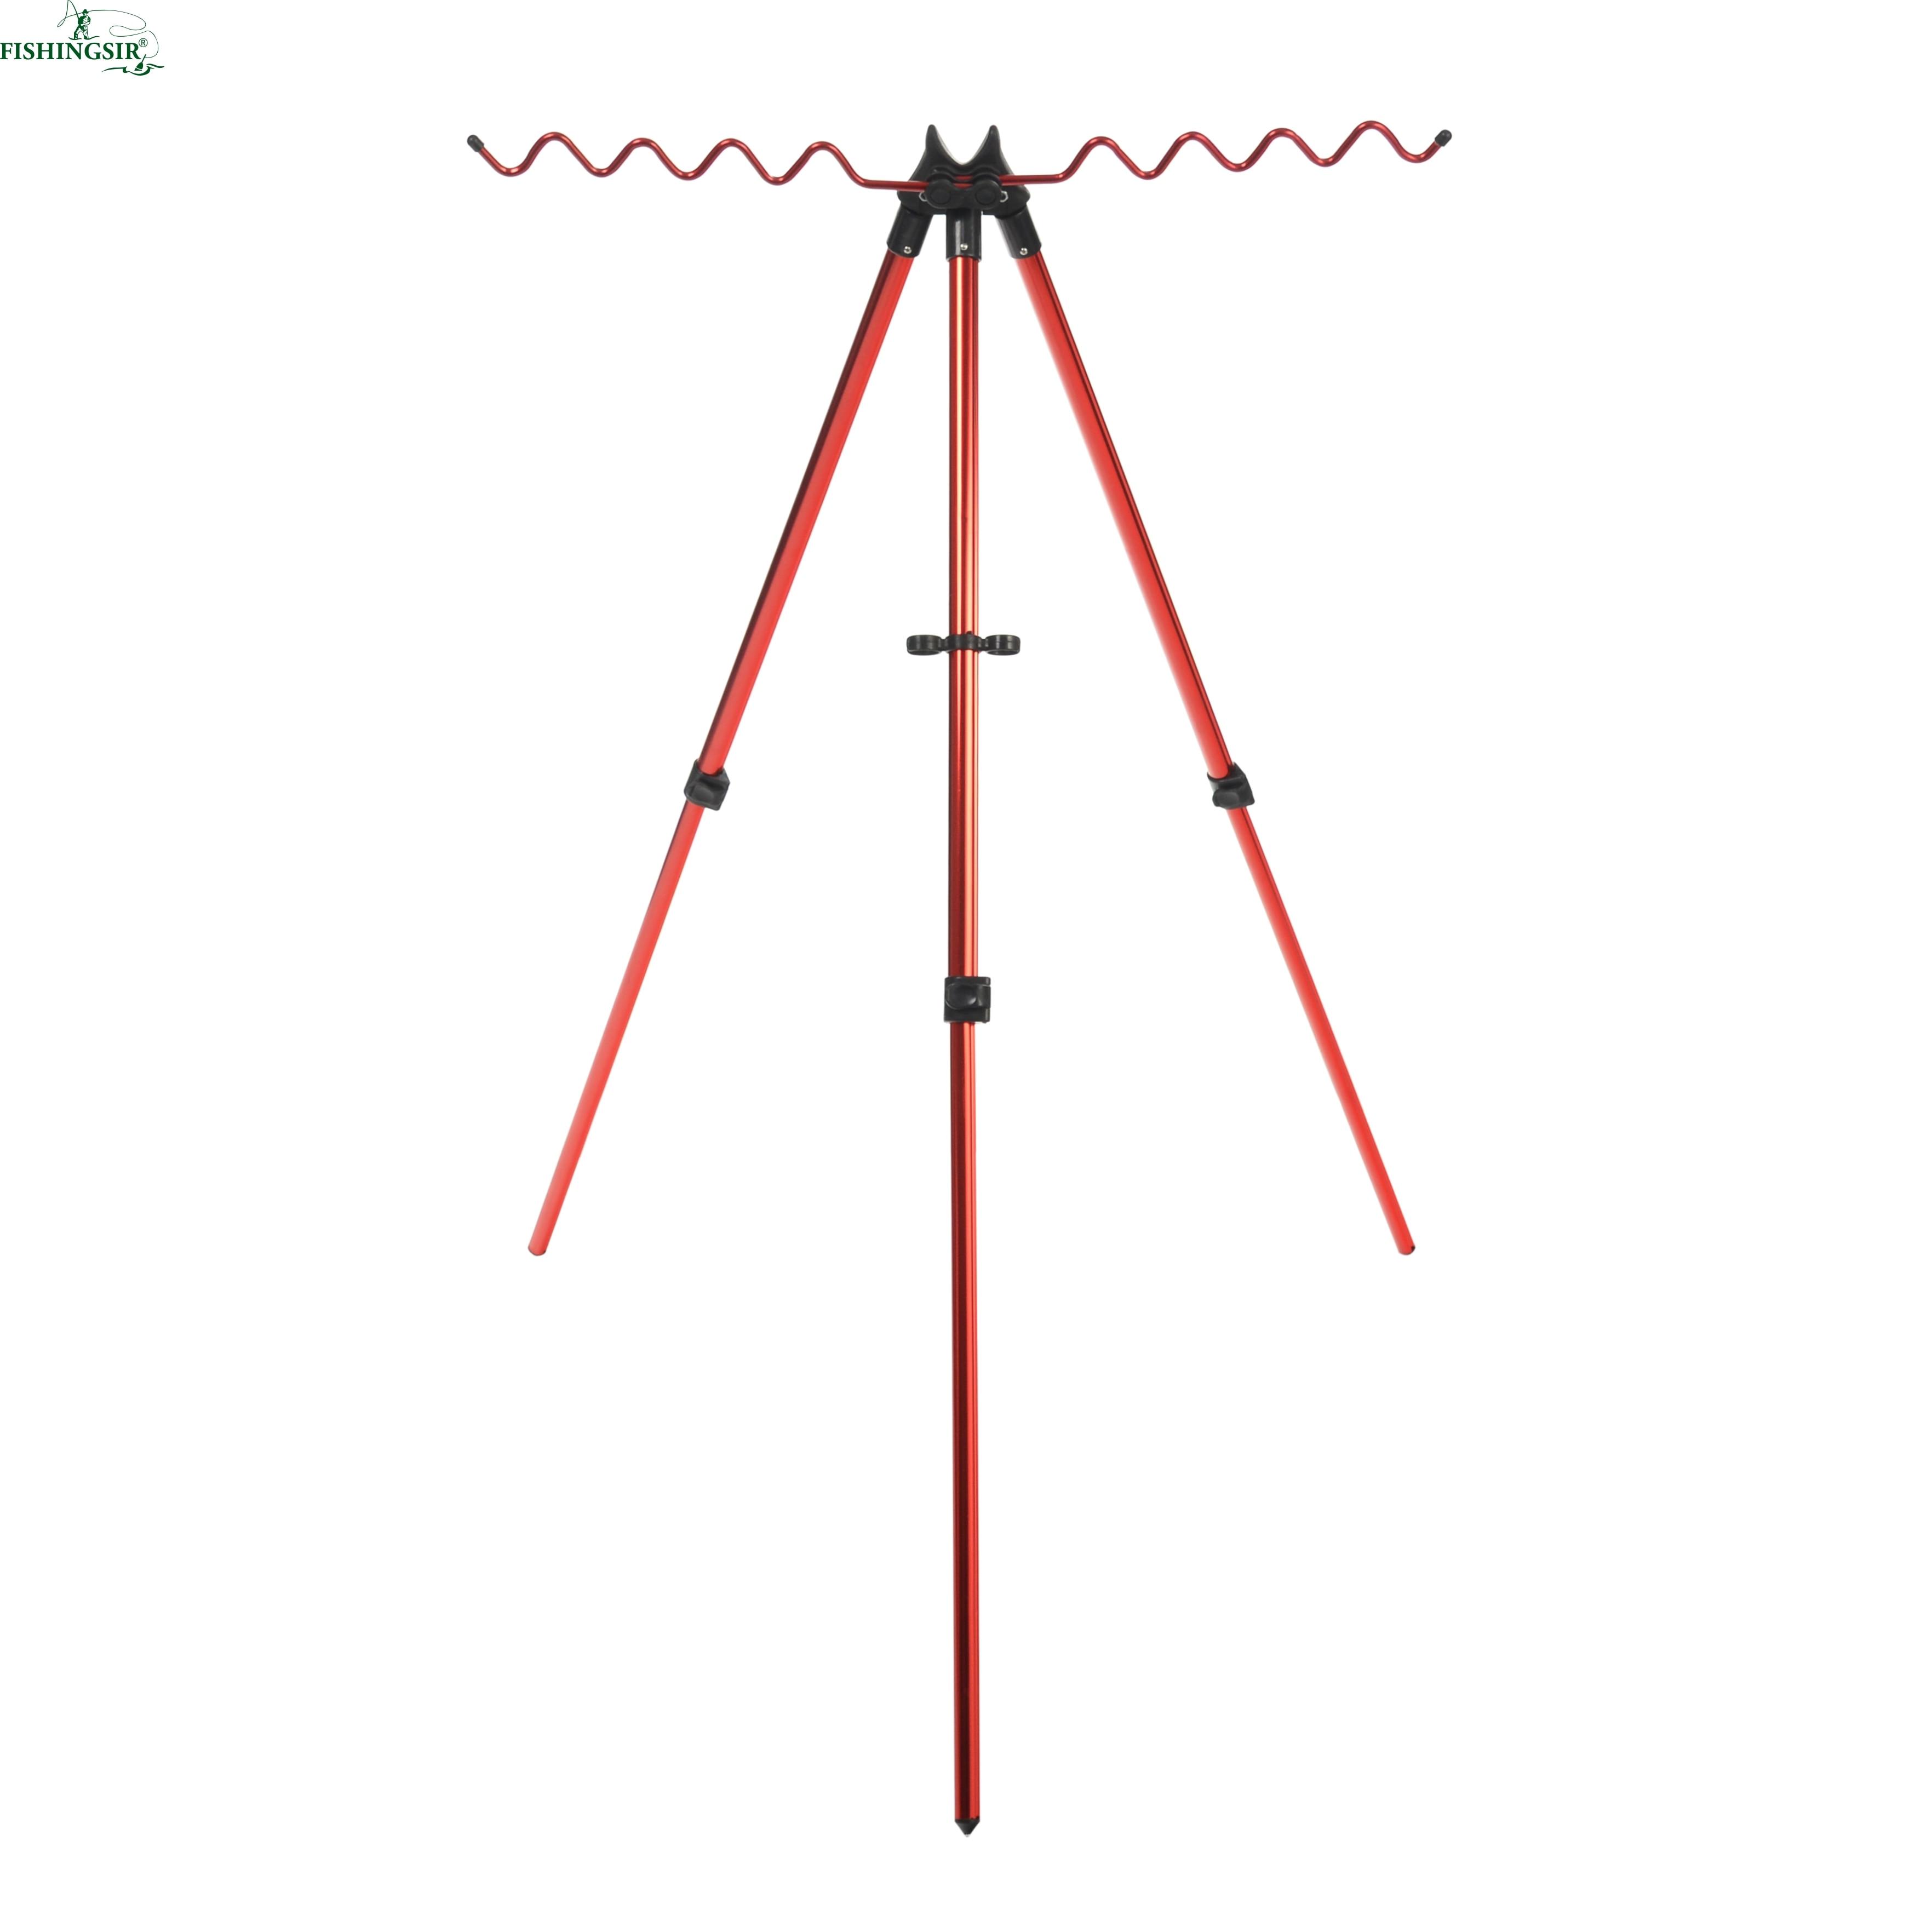 Portable Fishing <font><b>Rod</b></font> Holder Tripod Stand Aluminum Alloy Telescopic Fishing Pole Holder Adjustable <font><b>3</b></font> Sections Pesca Tackle Tools